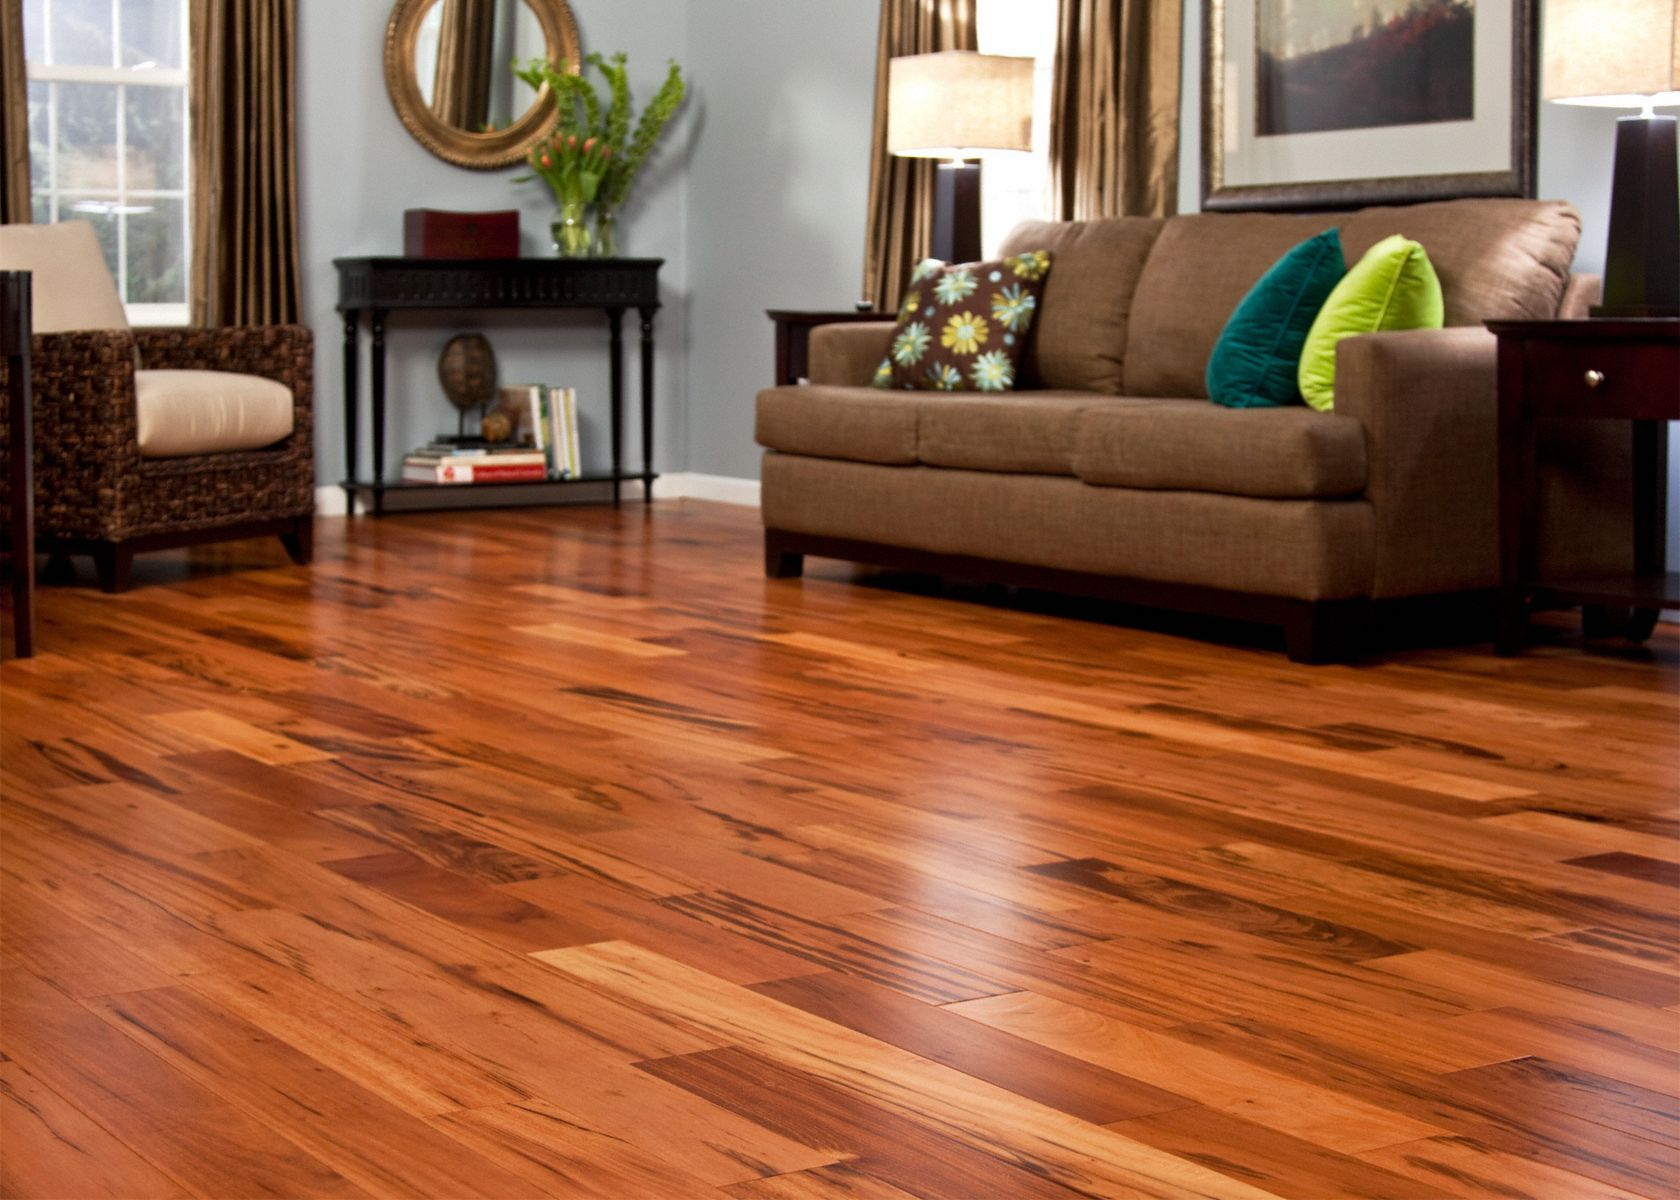 7 16 X 4 3 4 Brazilian Koa Quick Clic Engineered Schon Quick Clic Engineered Flooring Hardwood Floors Small Basement Remodel